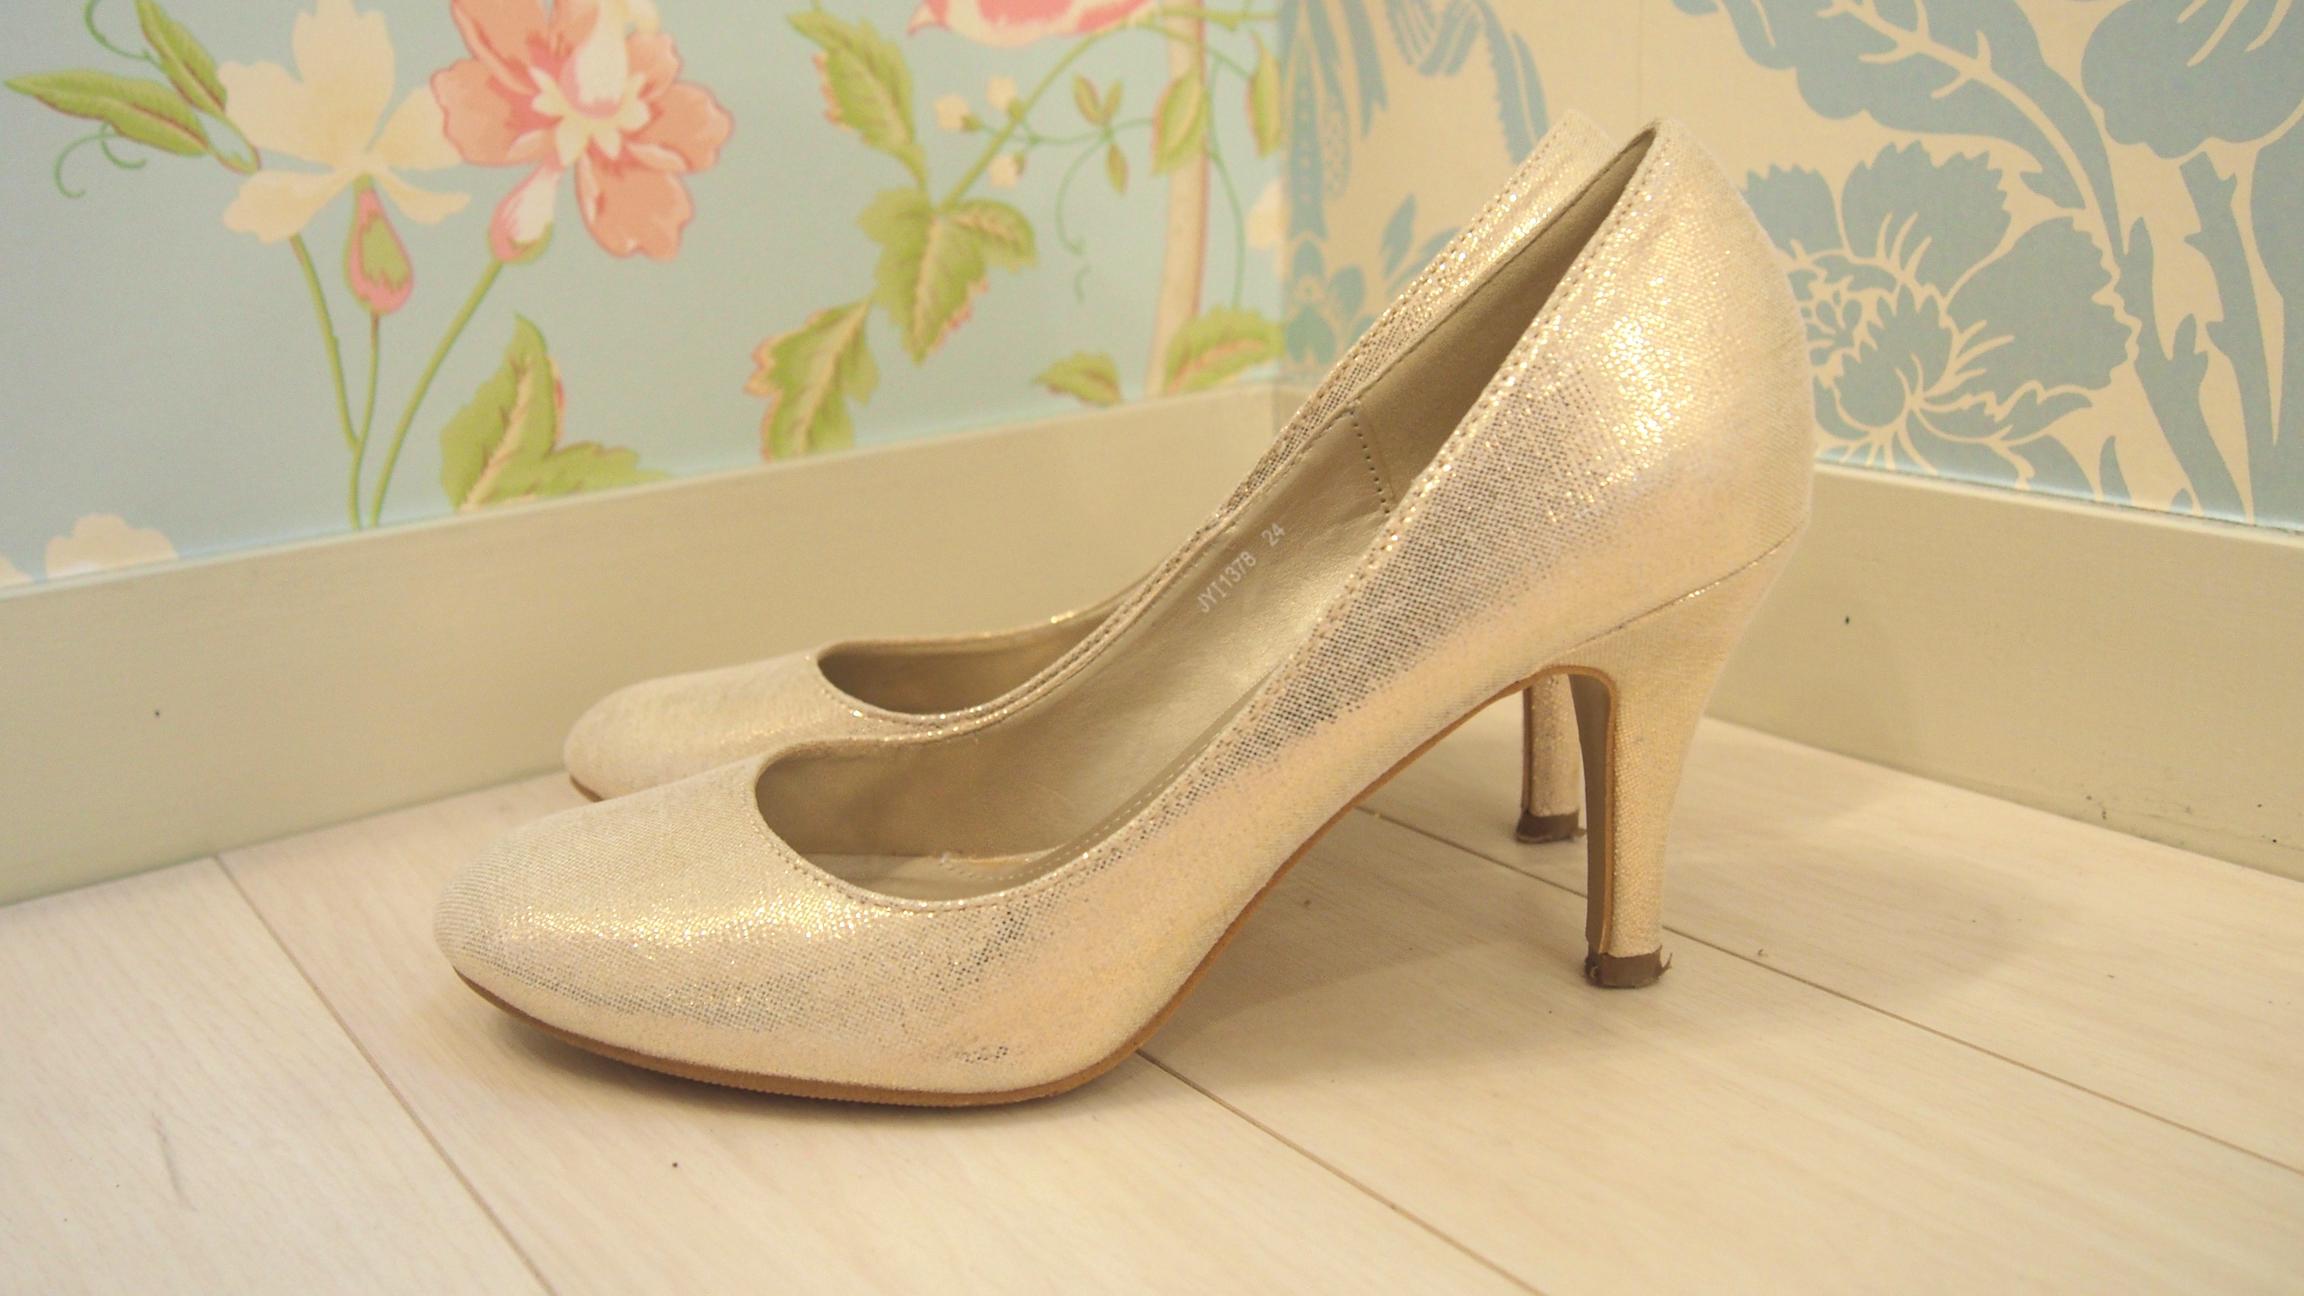 nr_shoes_061